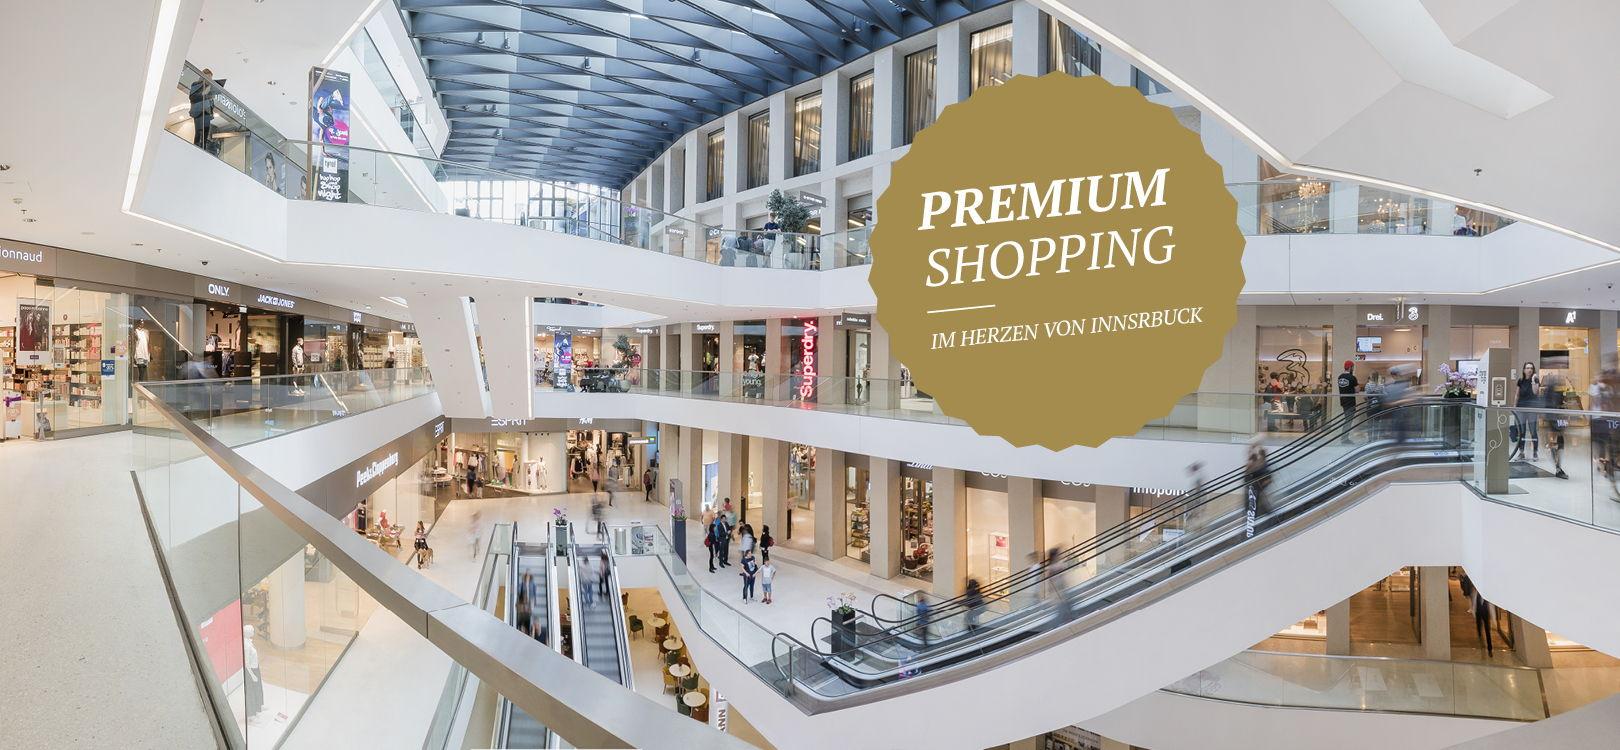 Premium Shopping in über 50 Shops